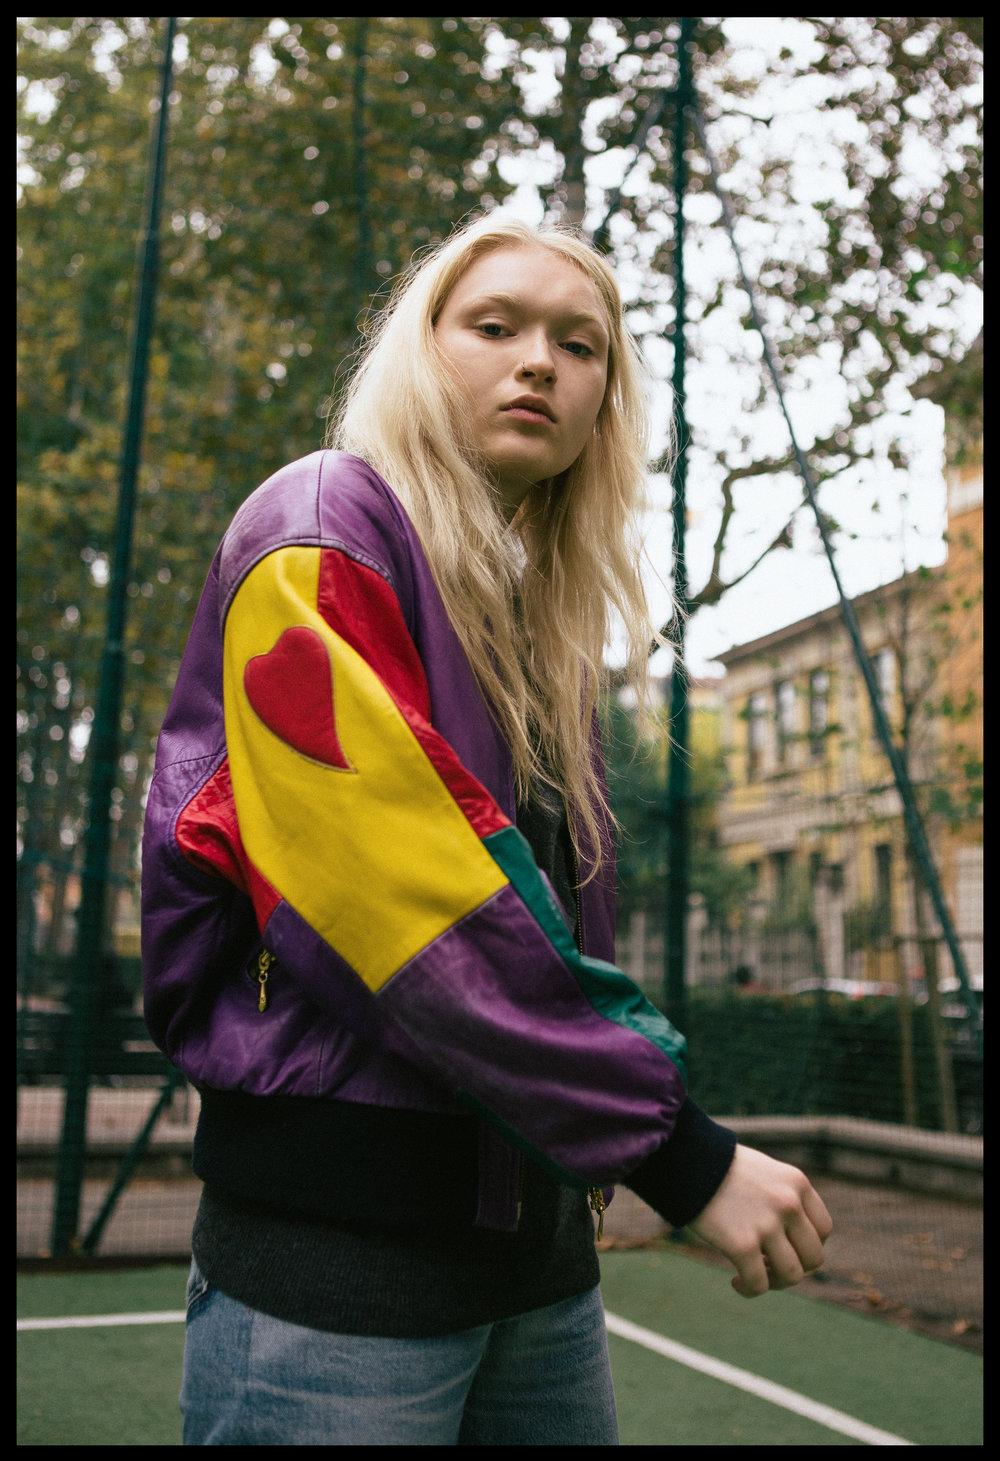 jacket VINTAGE, jumper LACOSTE, jeans RE/DONE LEVI'S